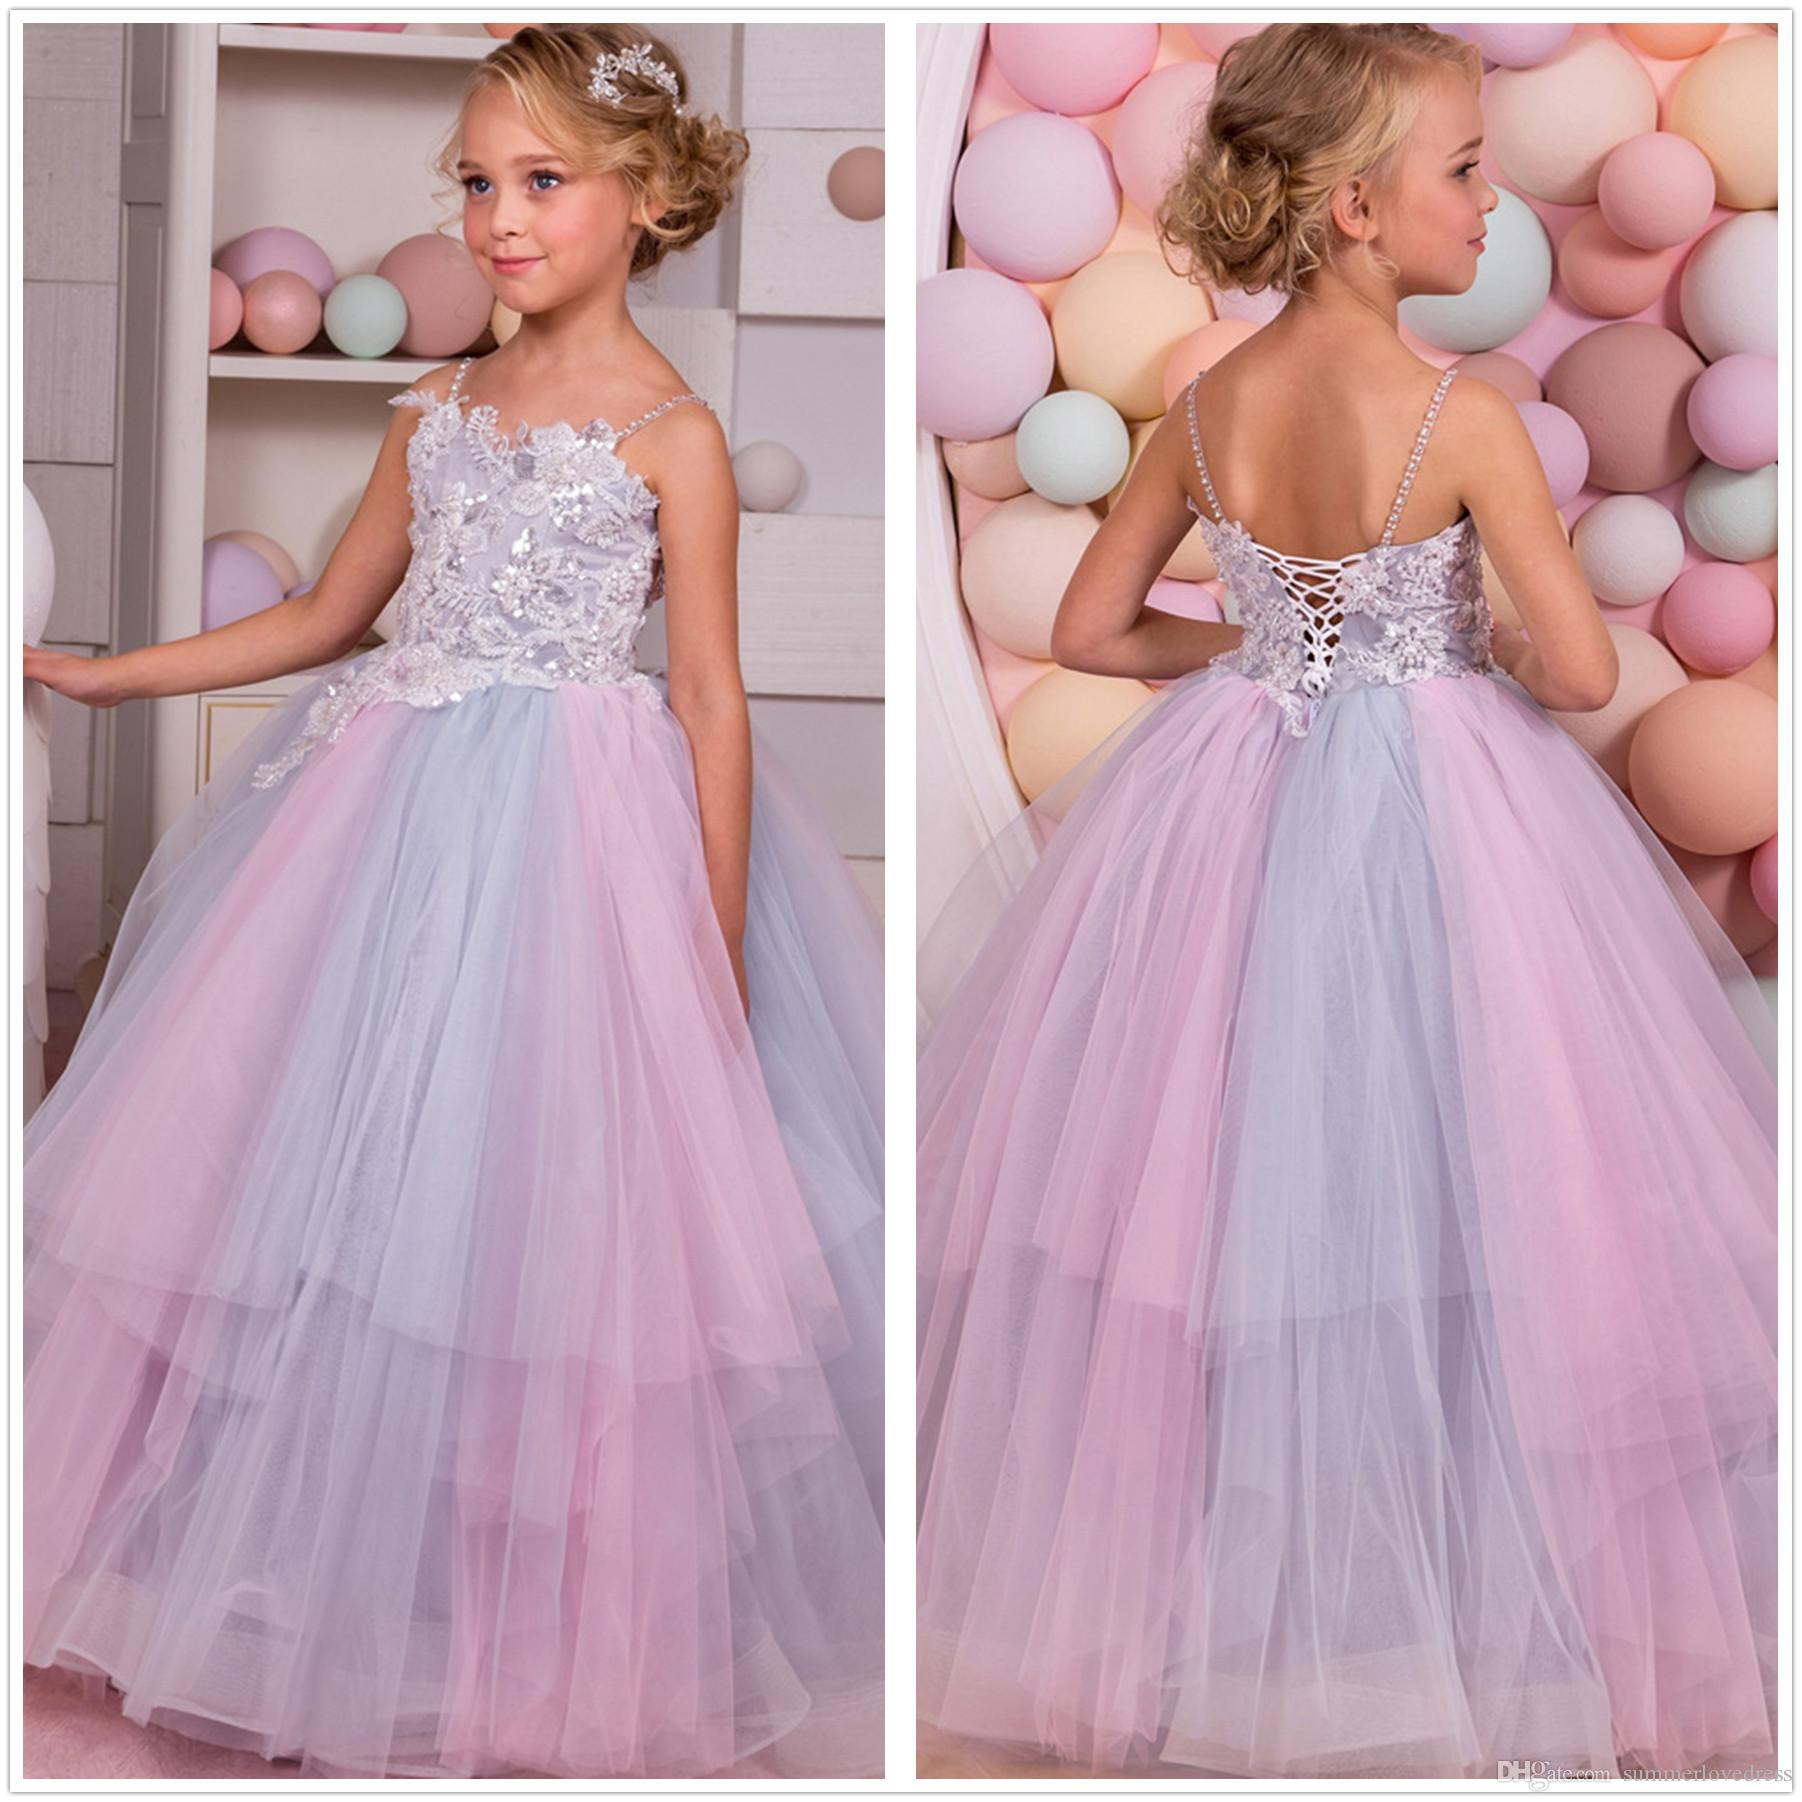 0b9831044e Elegant Spaghetti Straps Colorful Tulle A Line Flower Girl  Dresses Lace  Applique Layered Ruffles Little Girls  Wedding Party Dresses Flower Girl  Dress Sale ...